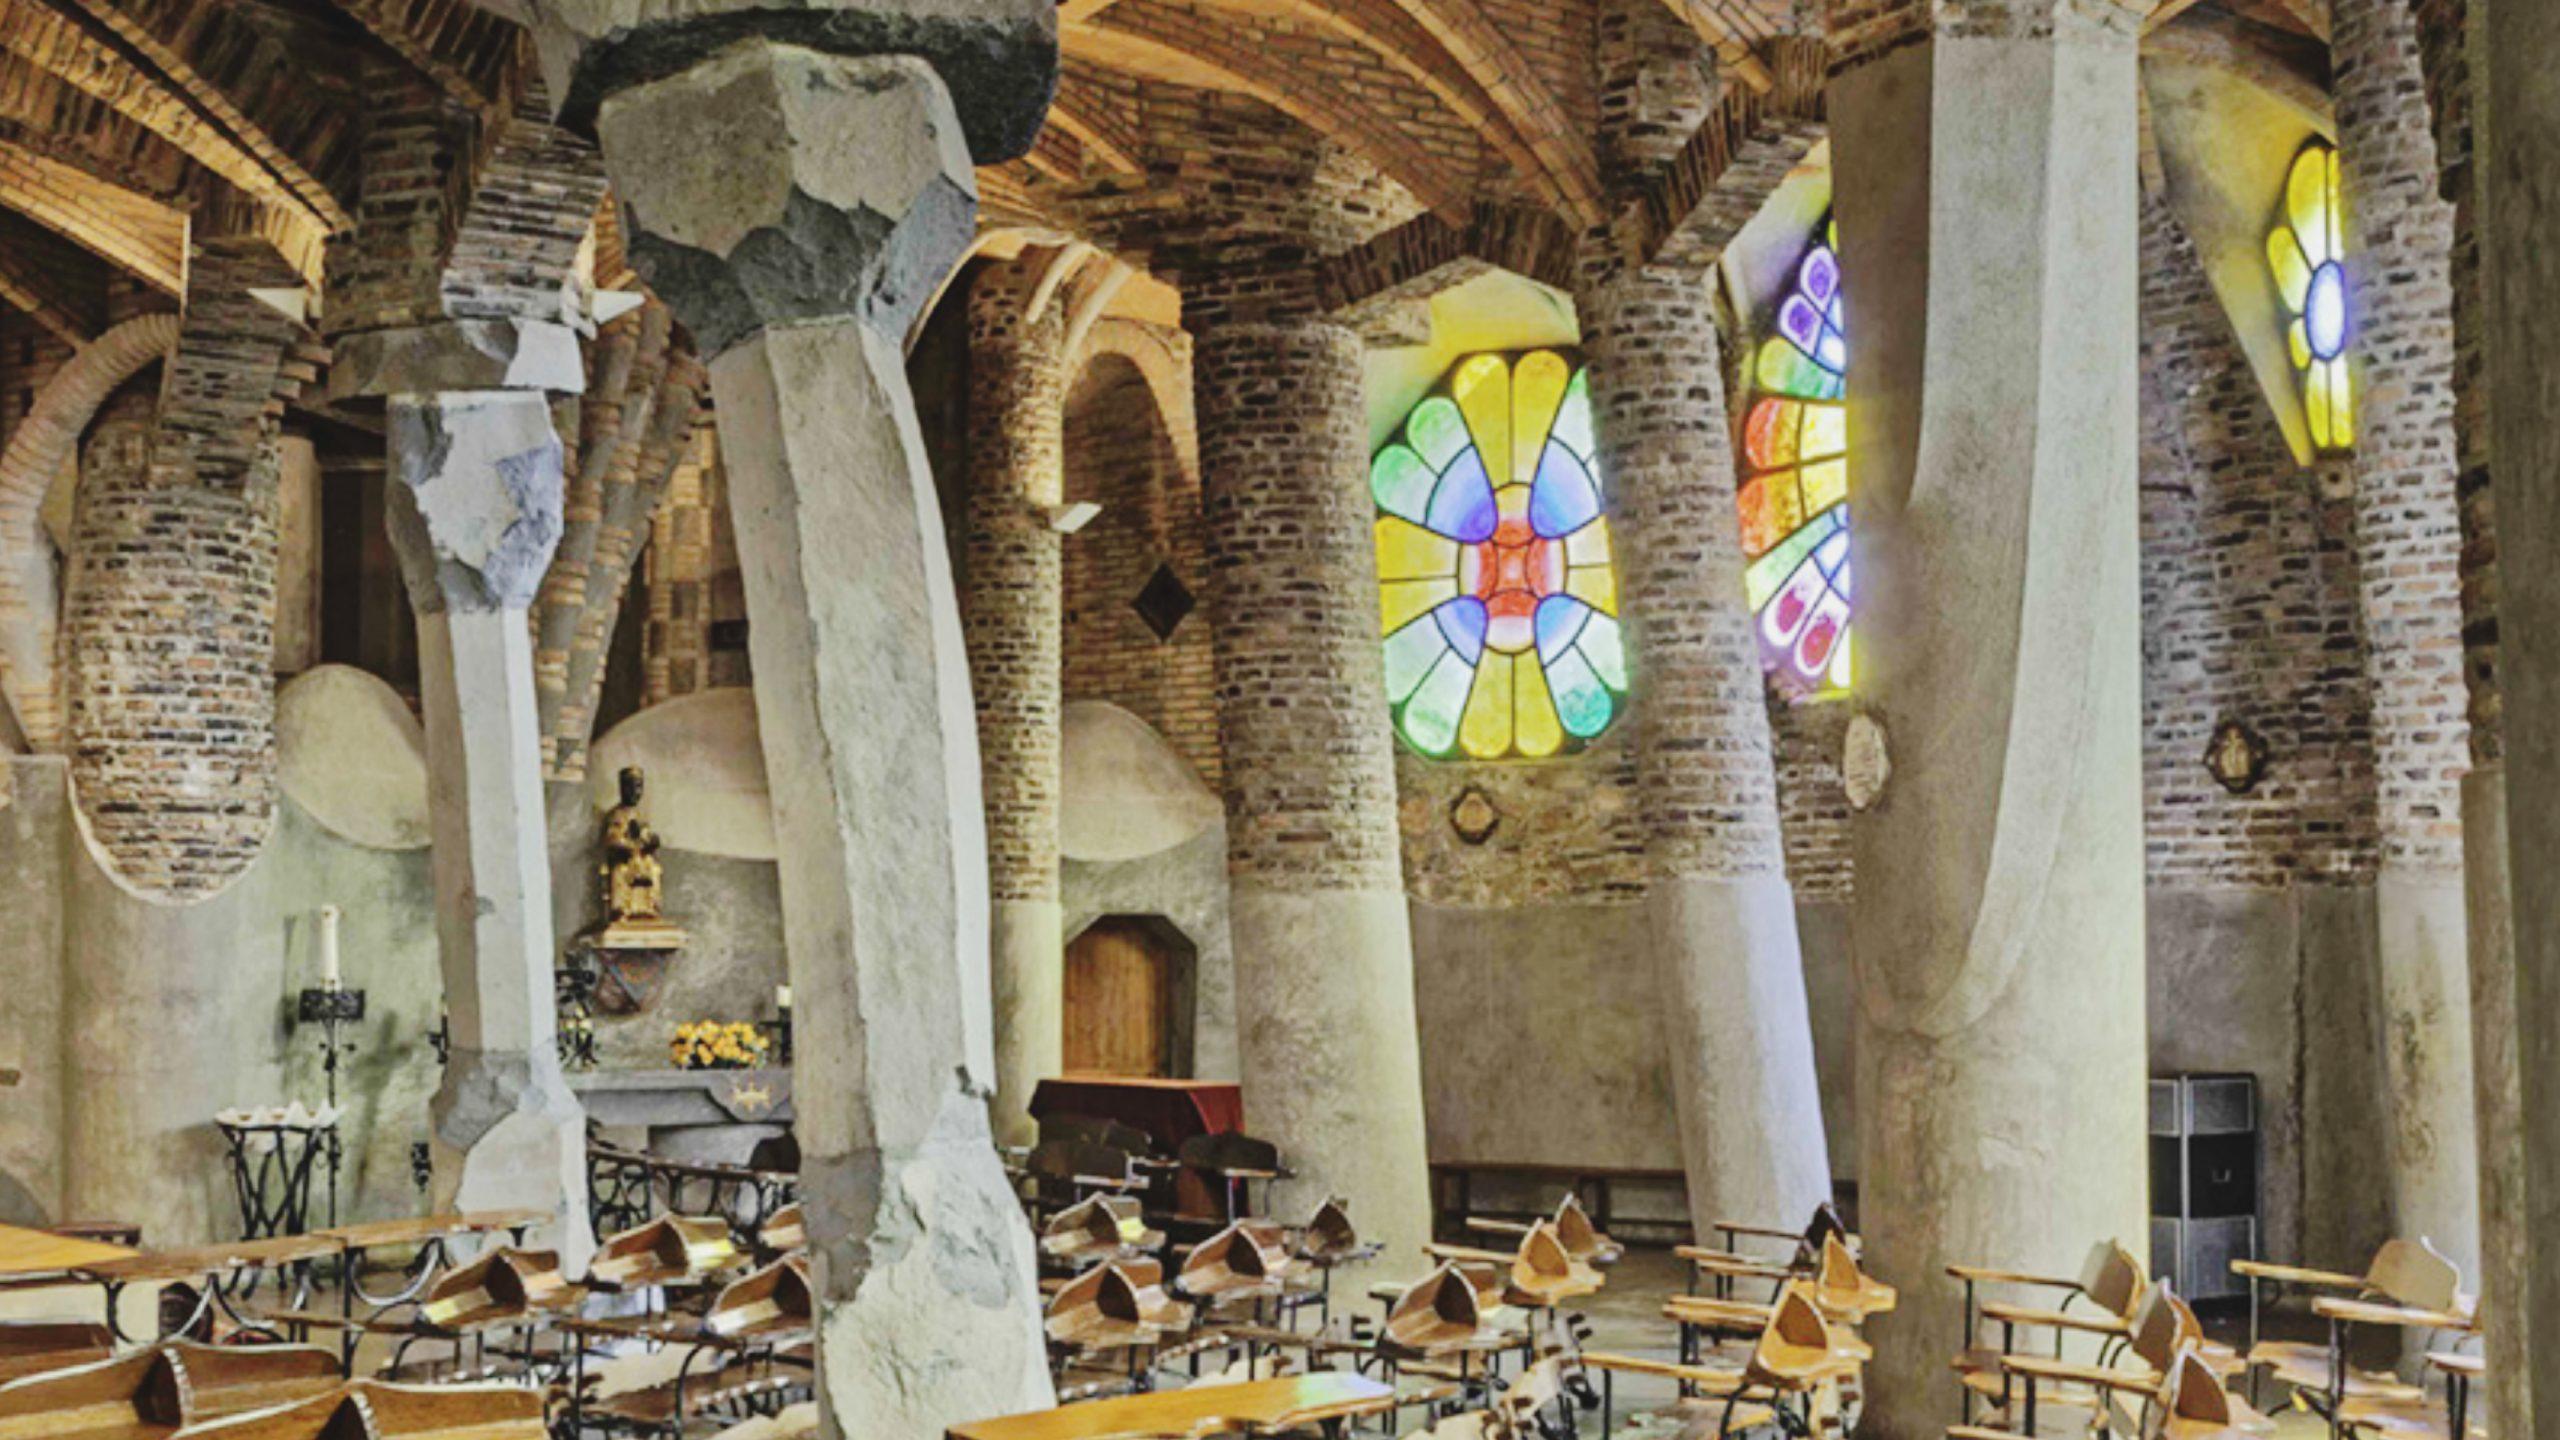 Escapada en Cataluña. Colonia Güell